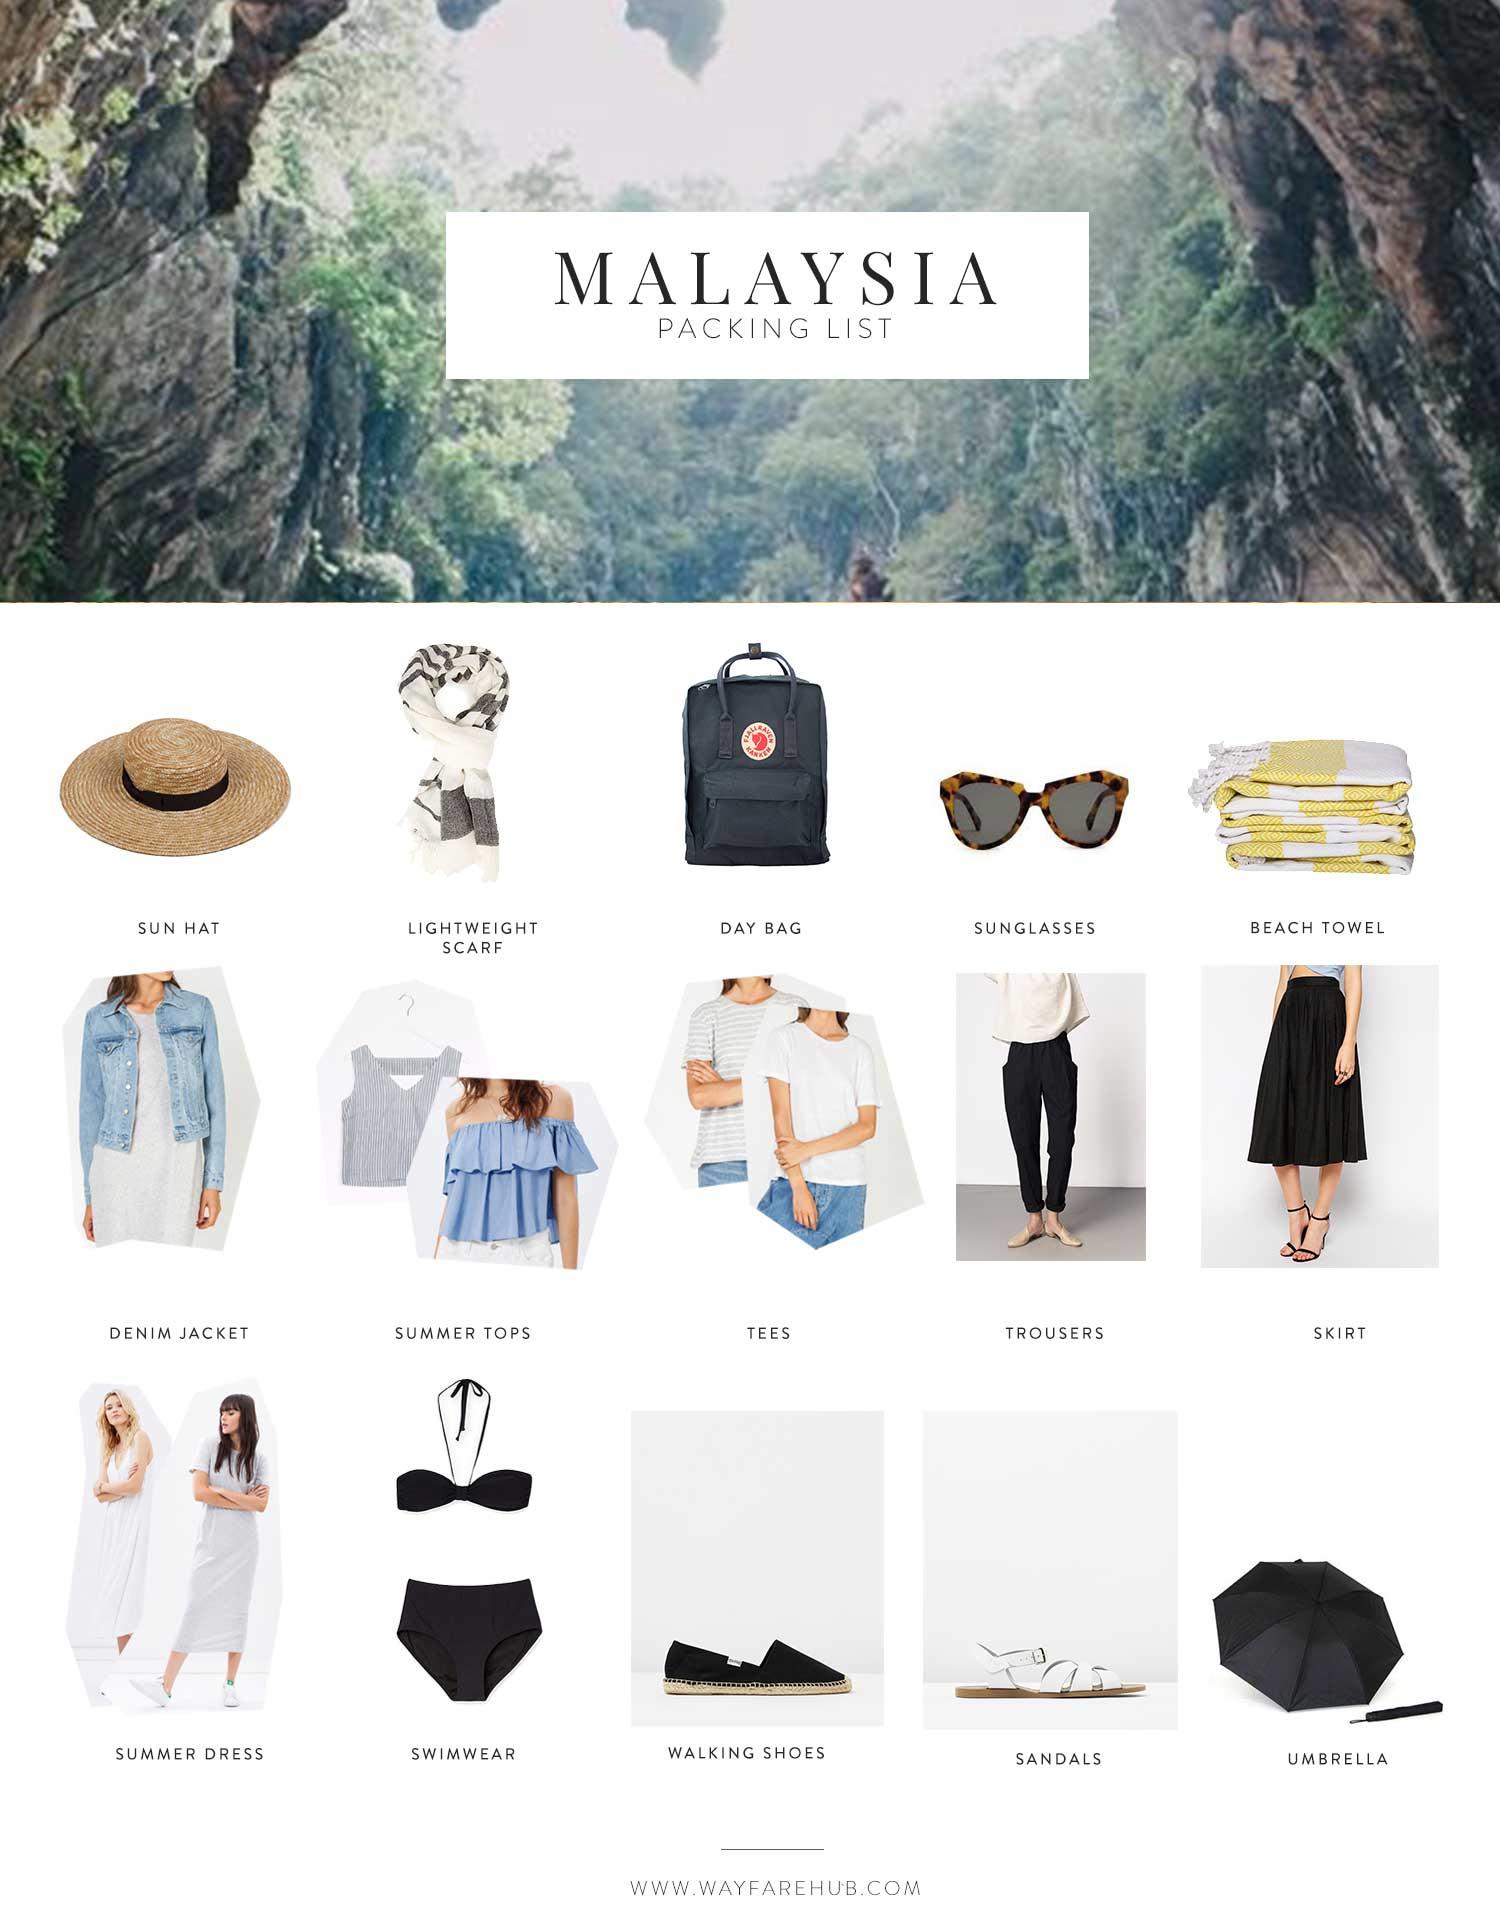 160220_Malaysia-Packing-List.jpg